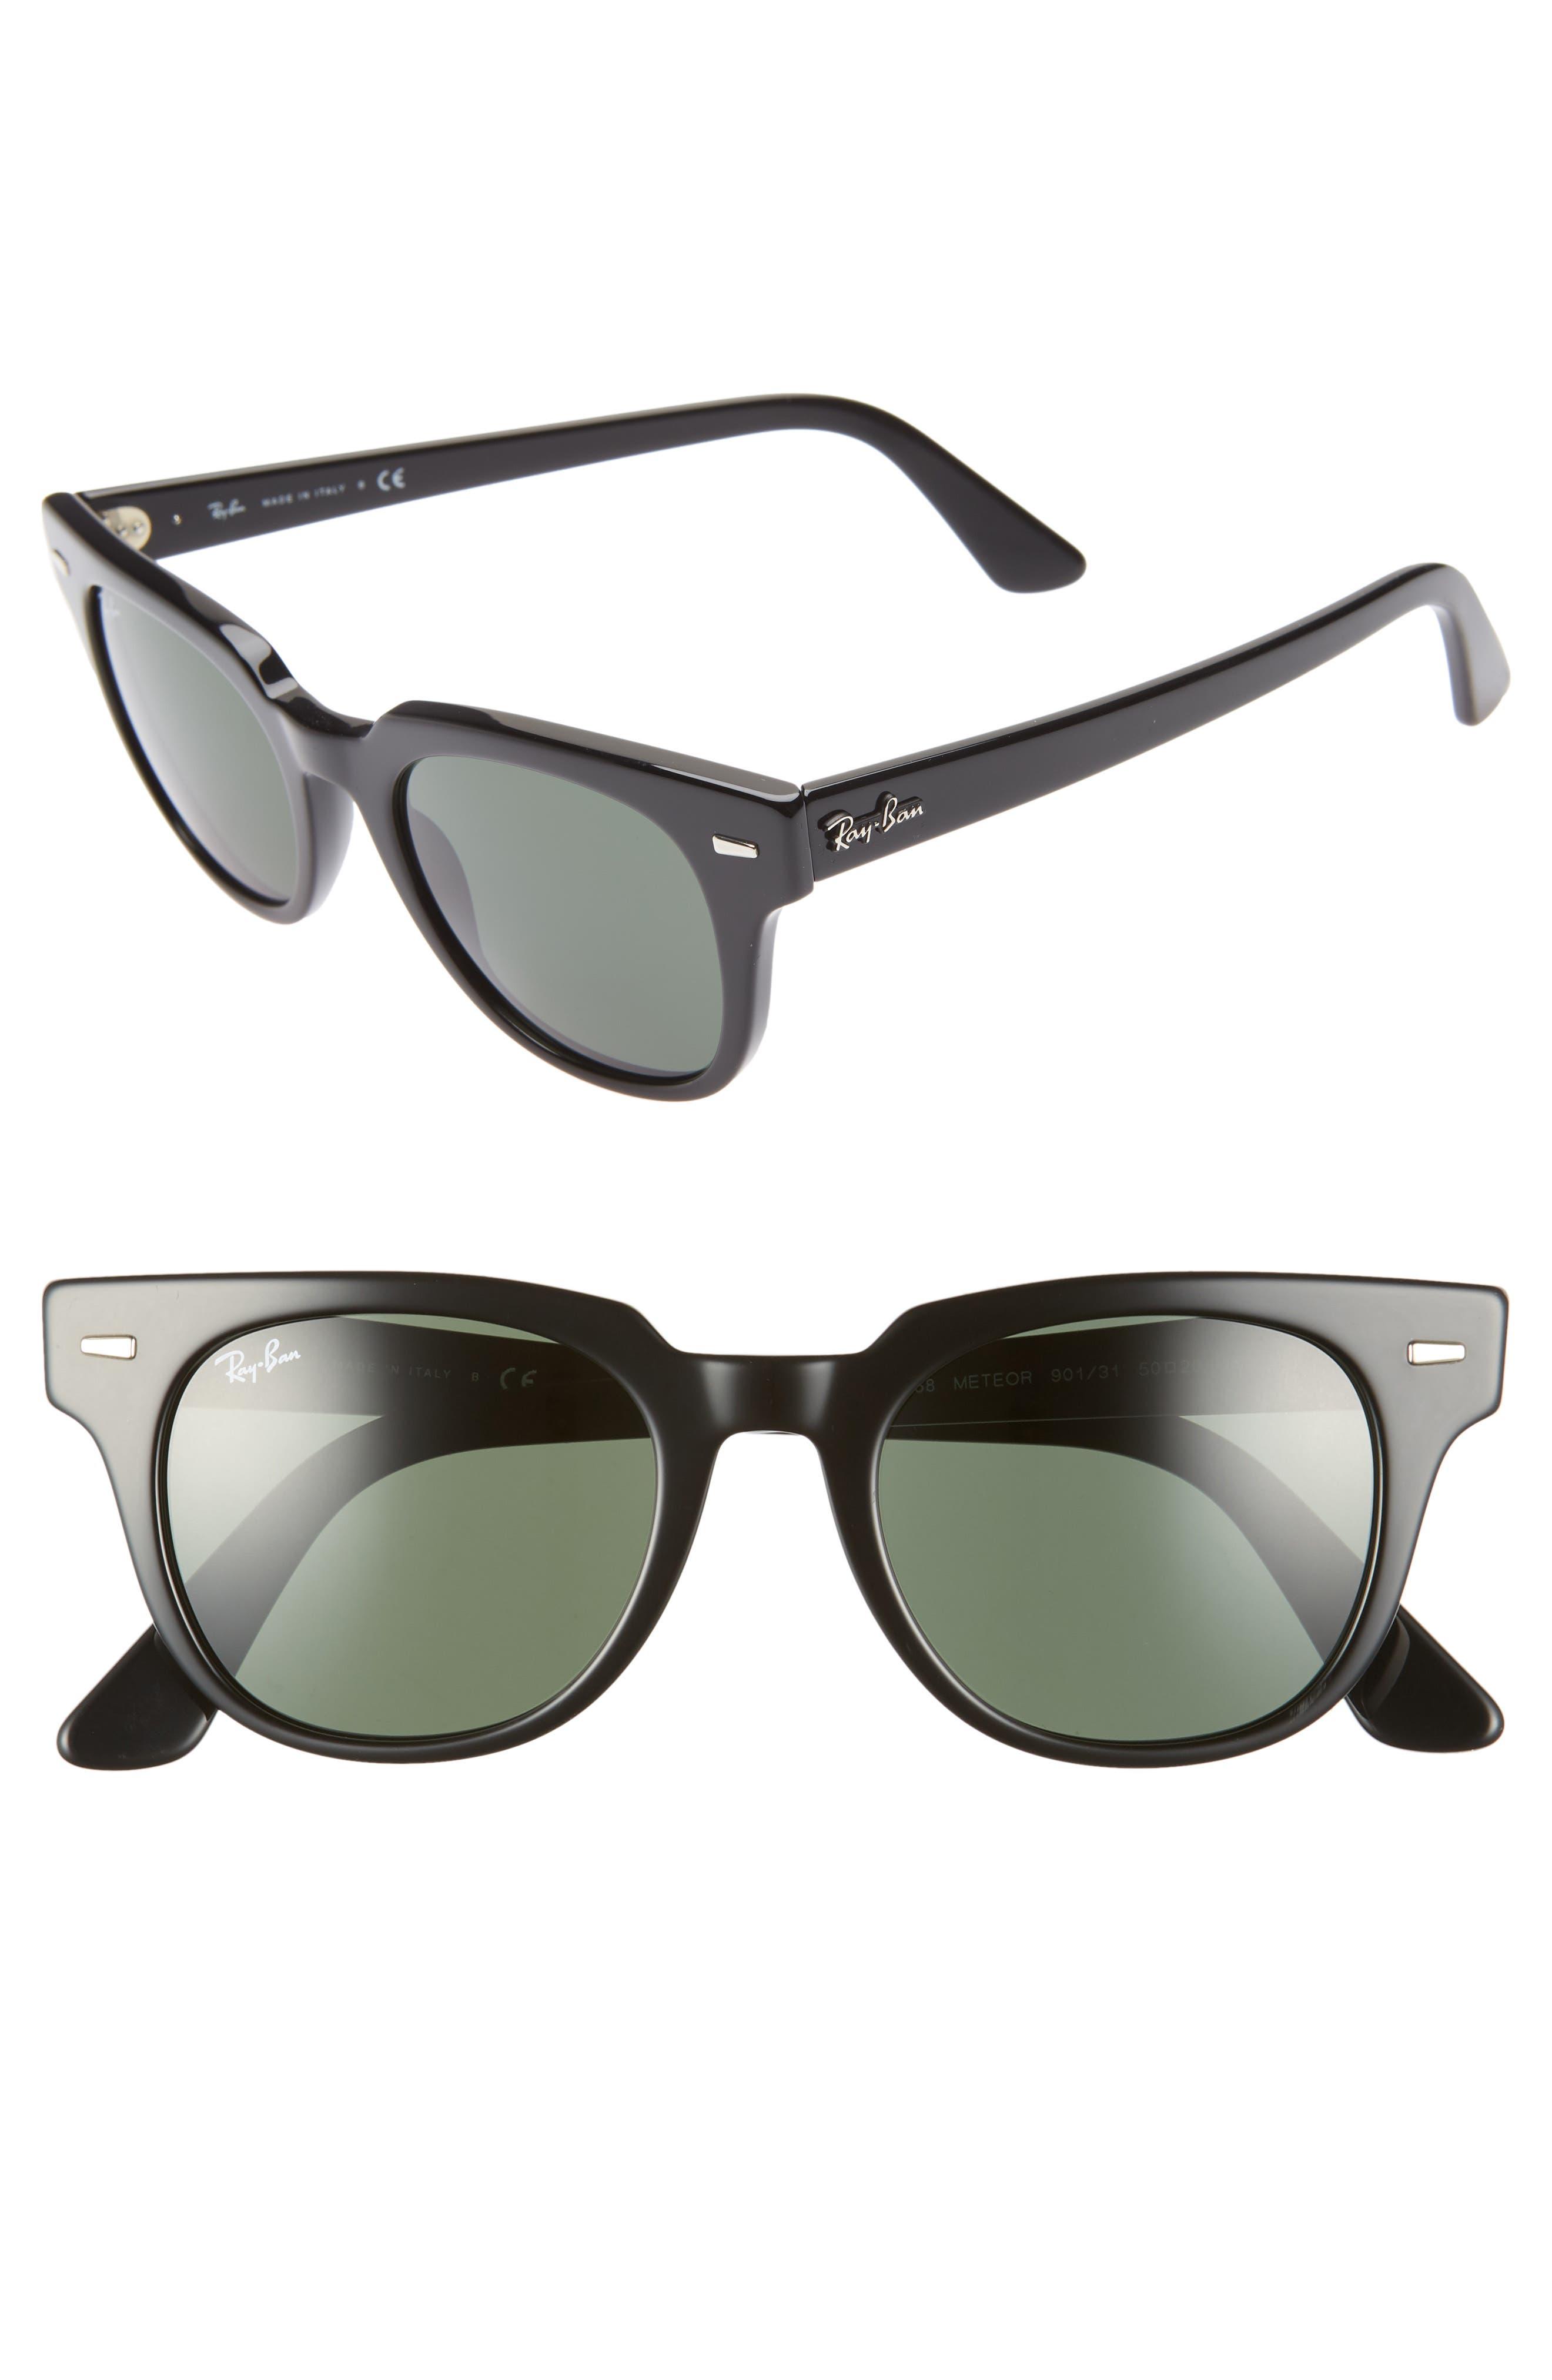 Meteor 50mm Wayfarer Sunglasses,                             Main thumbnail 1, color,                             BLACK SOLID